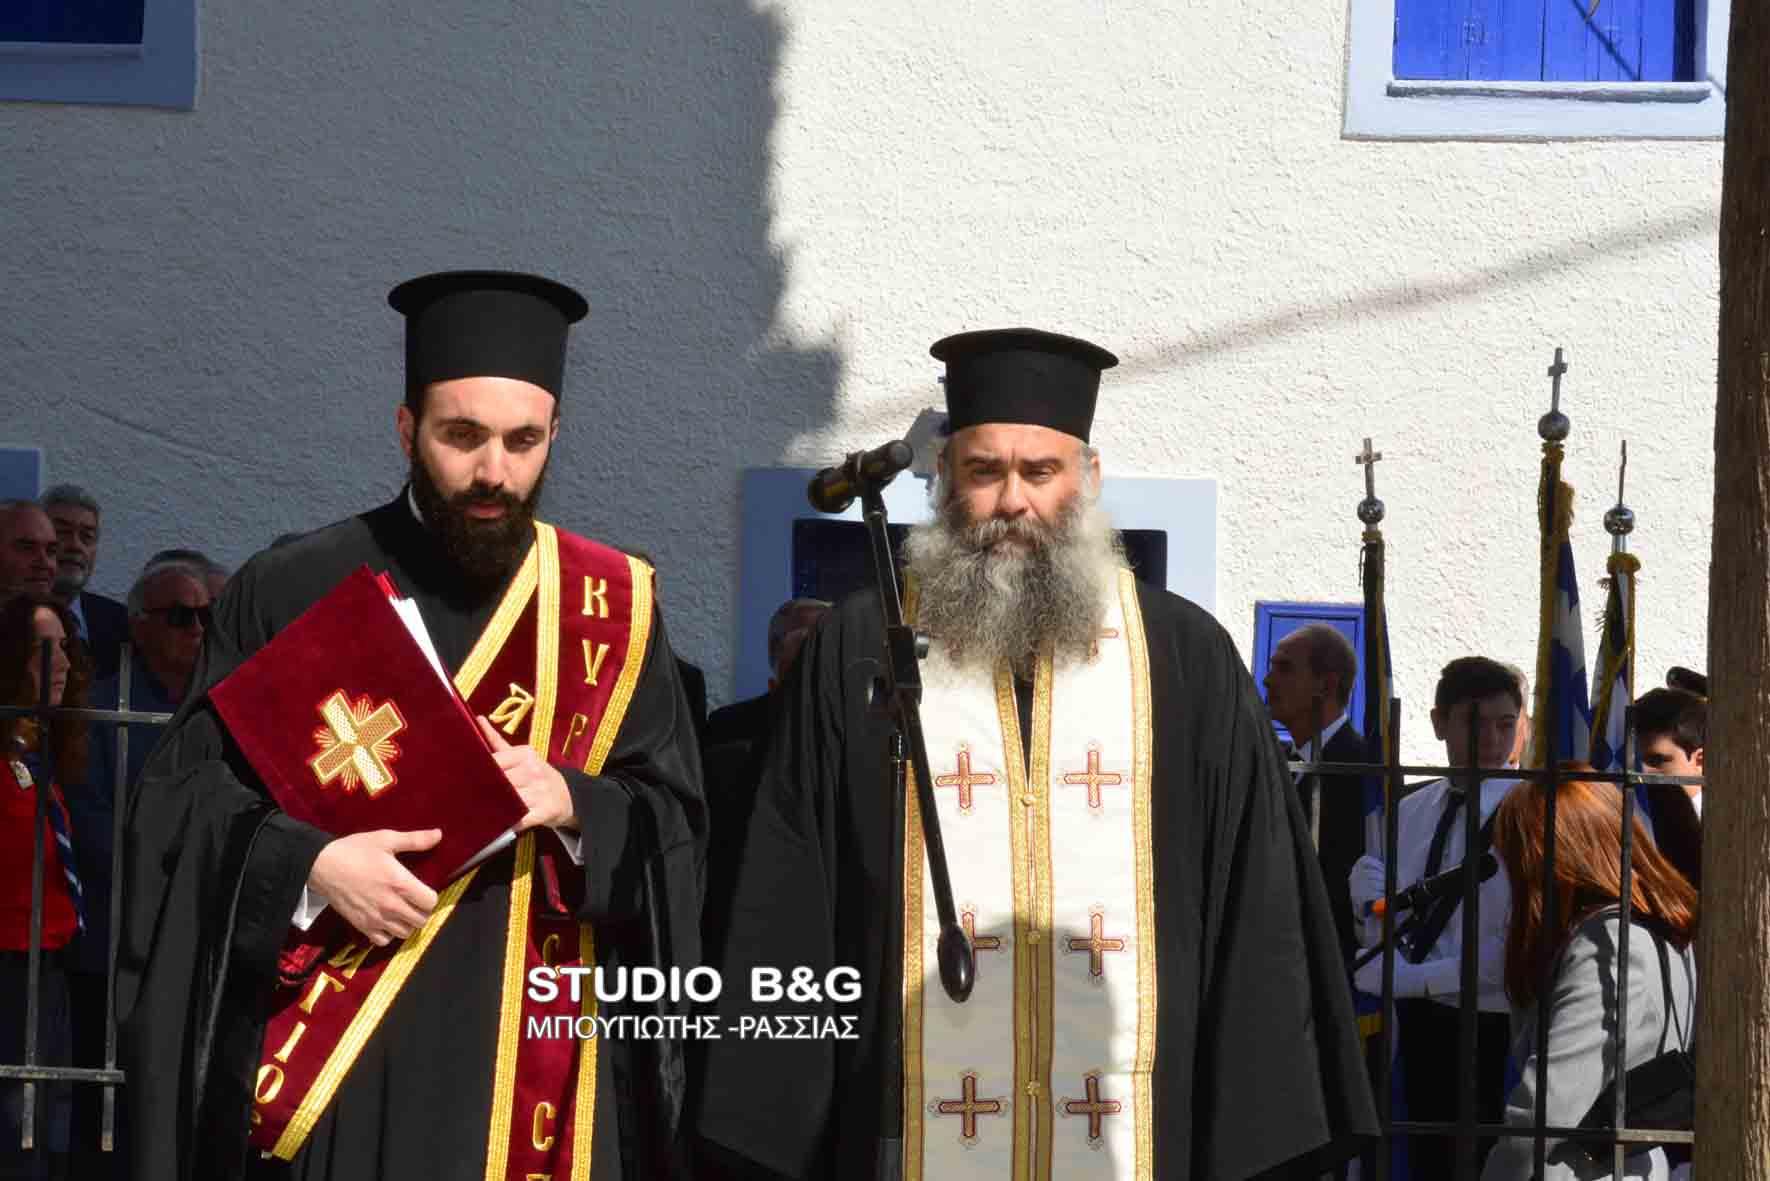 You are currently viewing Ο Μητροπολίτης Υδρας Εφραίμ στους εορτασμούς για την  Γ' εθνοσυνέλευση στην Ερμιόνη